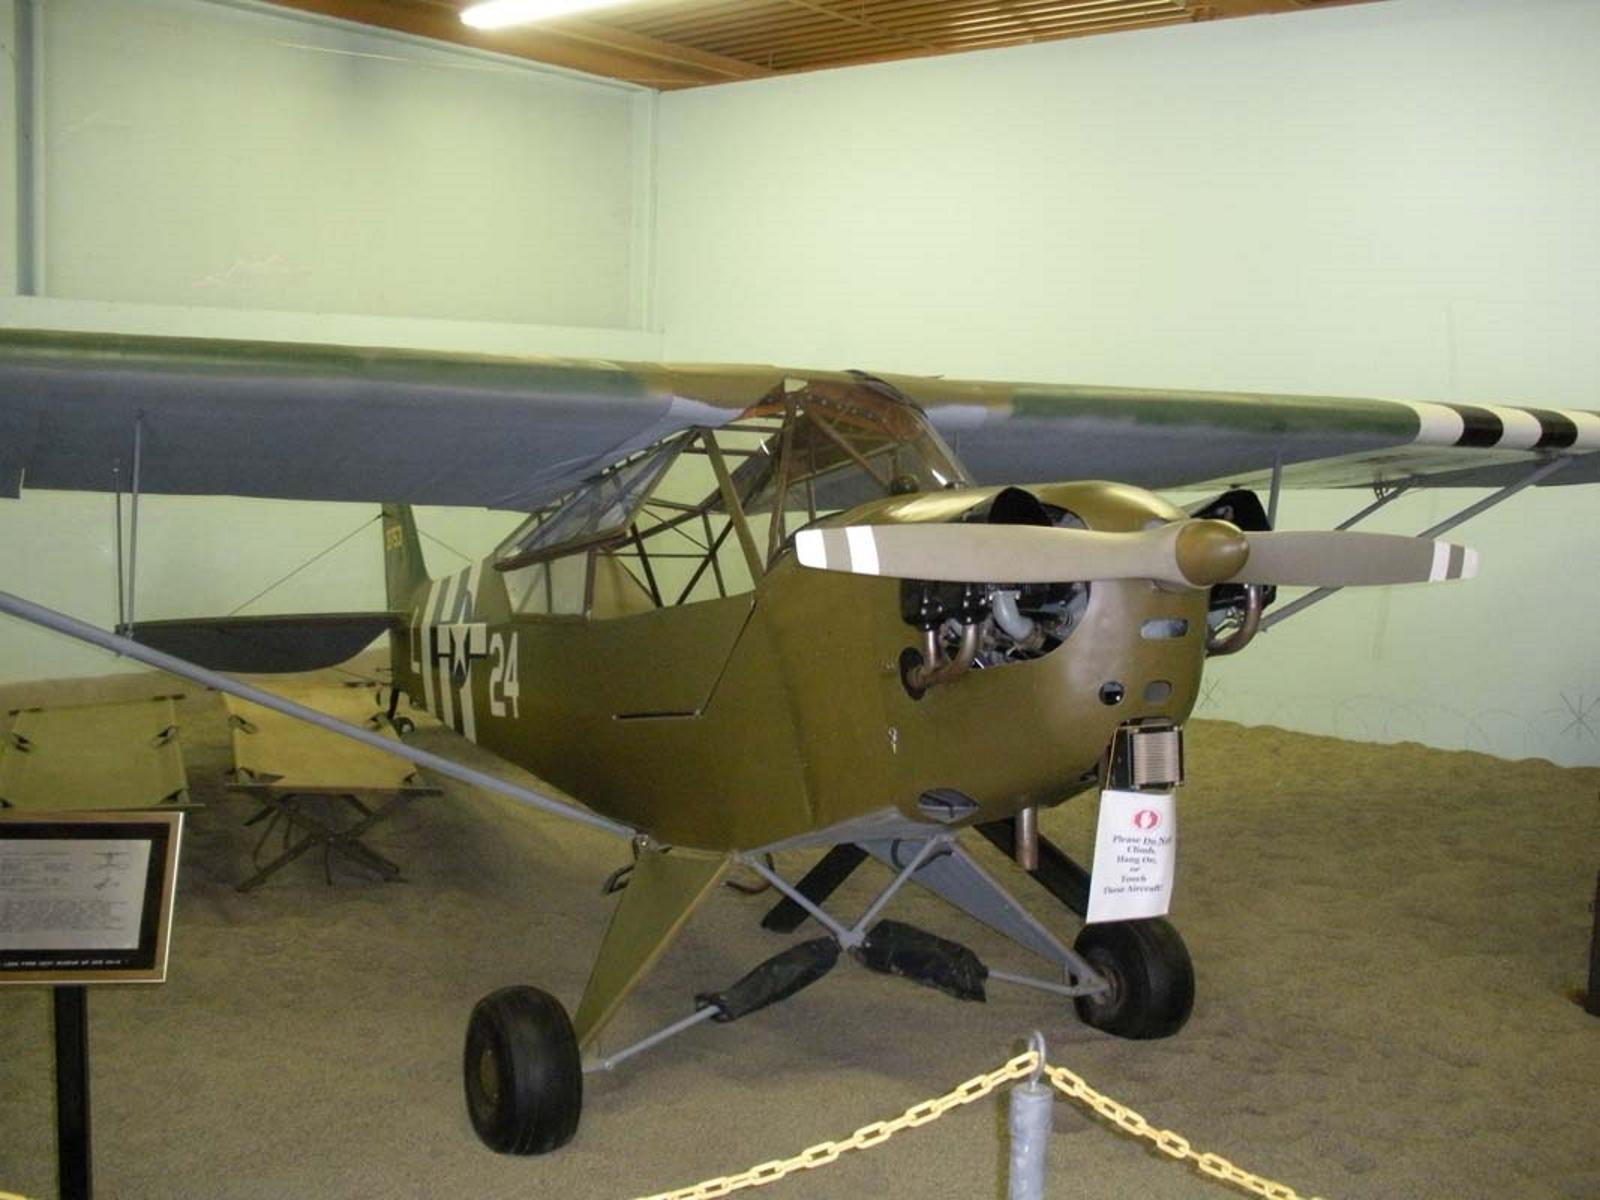 O Piper L-4 Gafanhoto